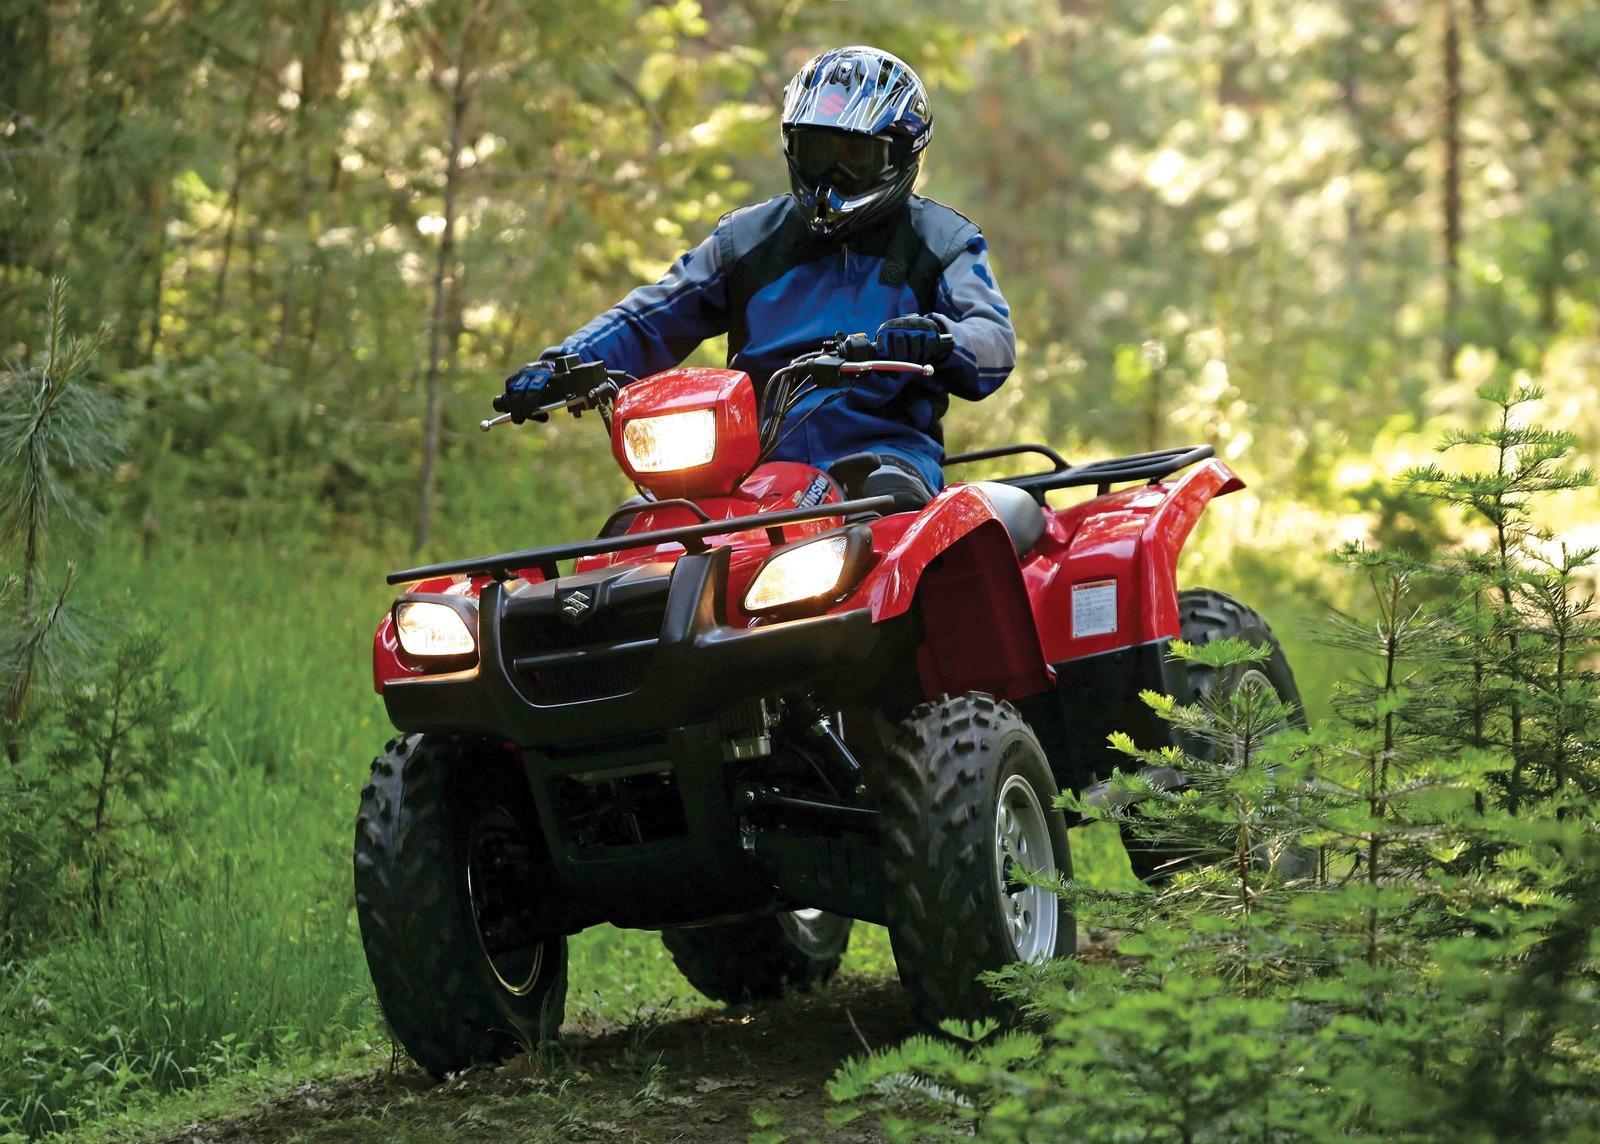 Suzuki Vinson X Automatic on Suzuki Single Cylinder Motorcycles